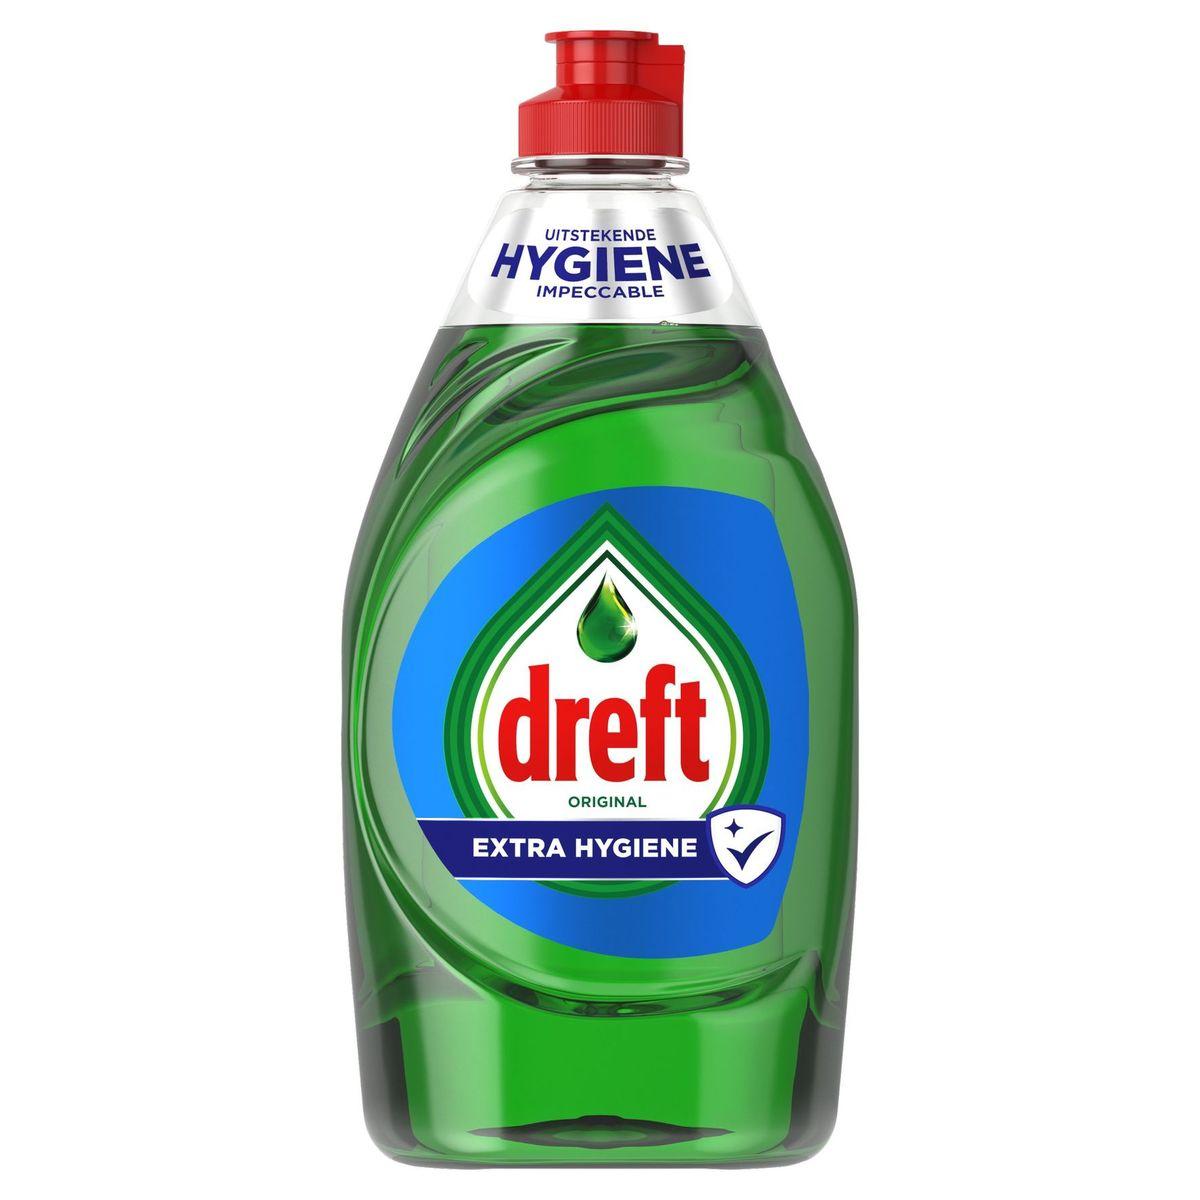 Dreft Extra Hygiëne Vloeibaar Afwasmiddel 440ml